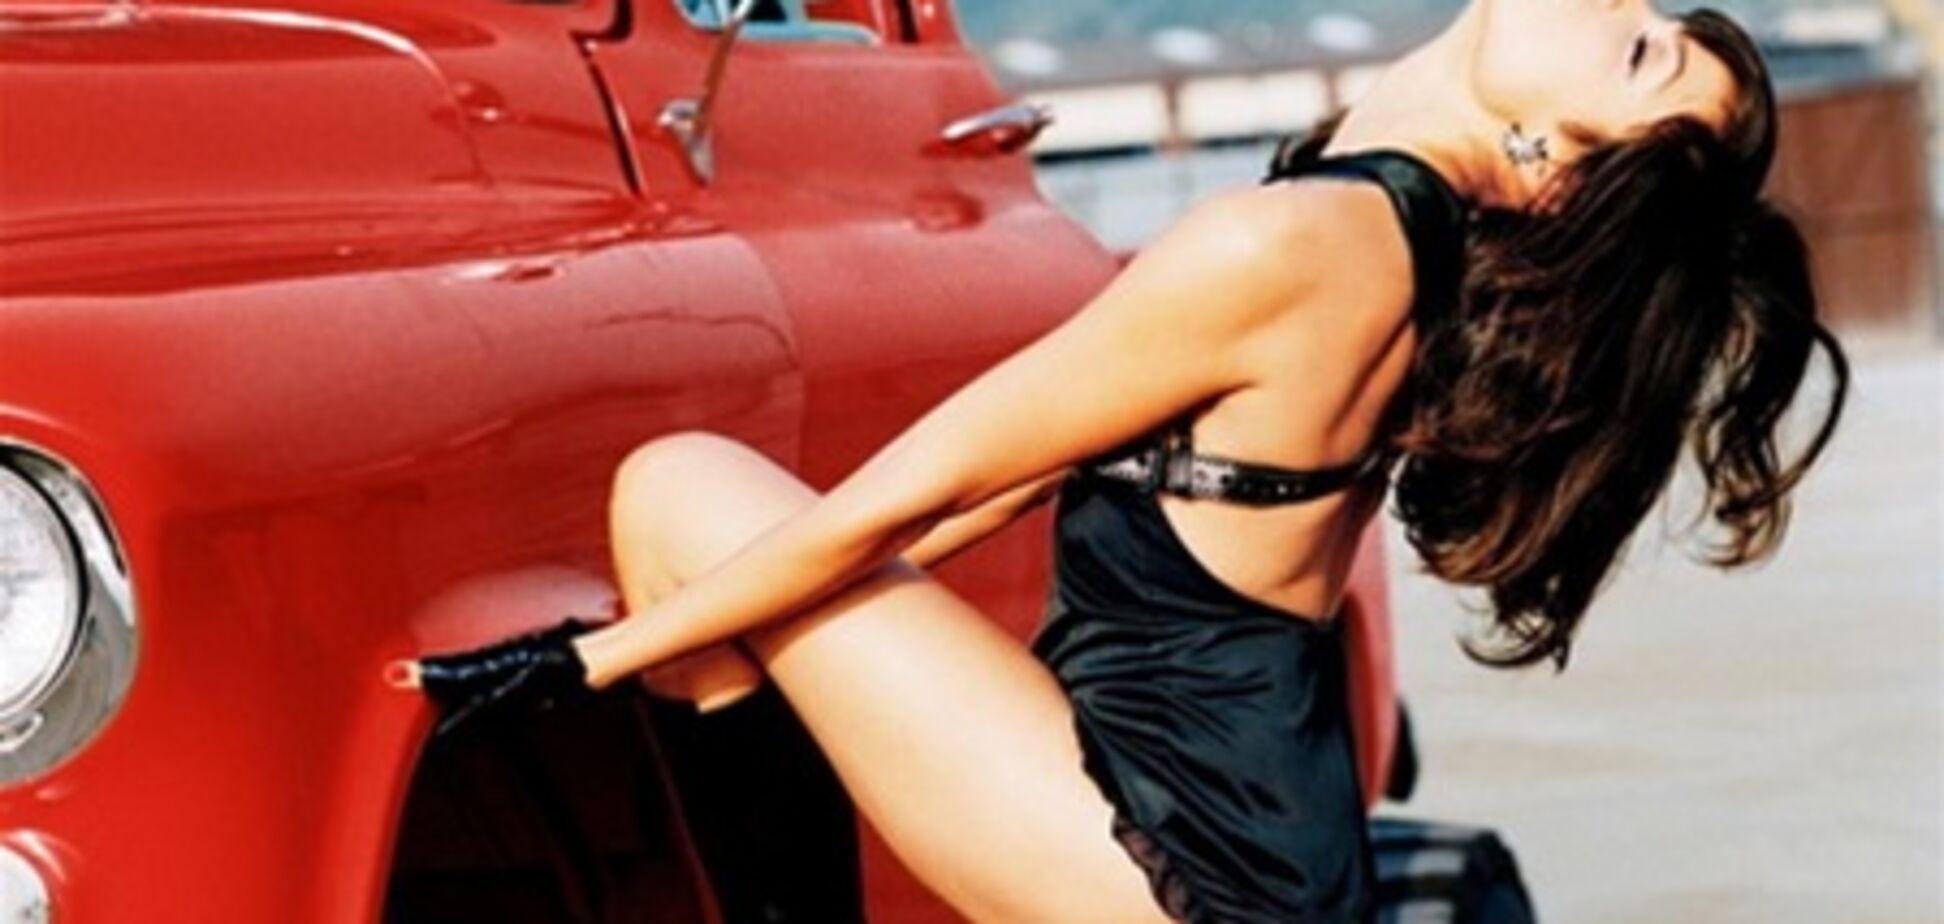 Розарио Доусон: секс посреди разбитых авто